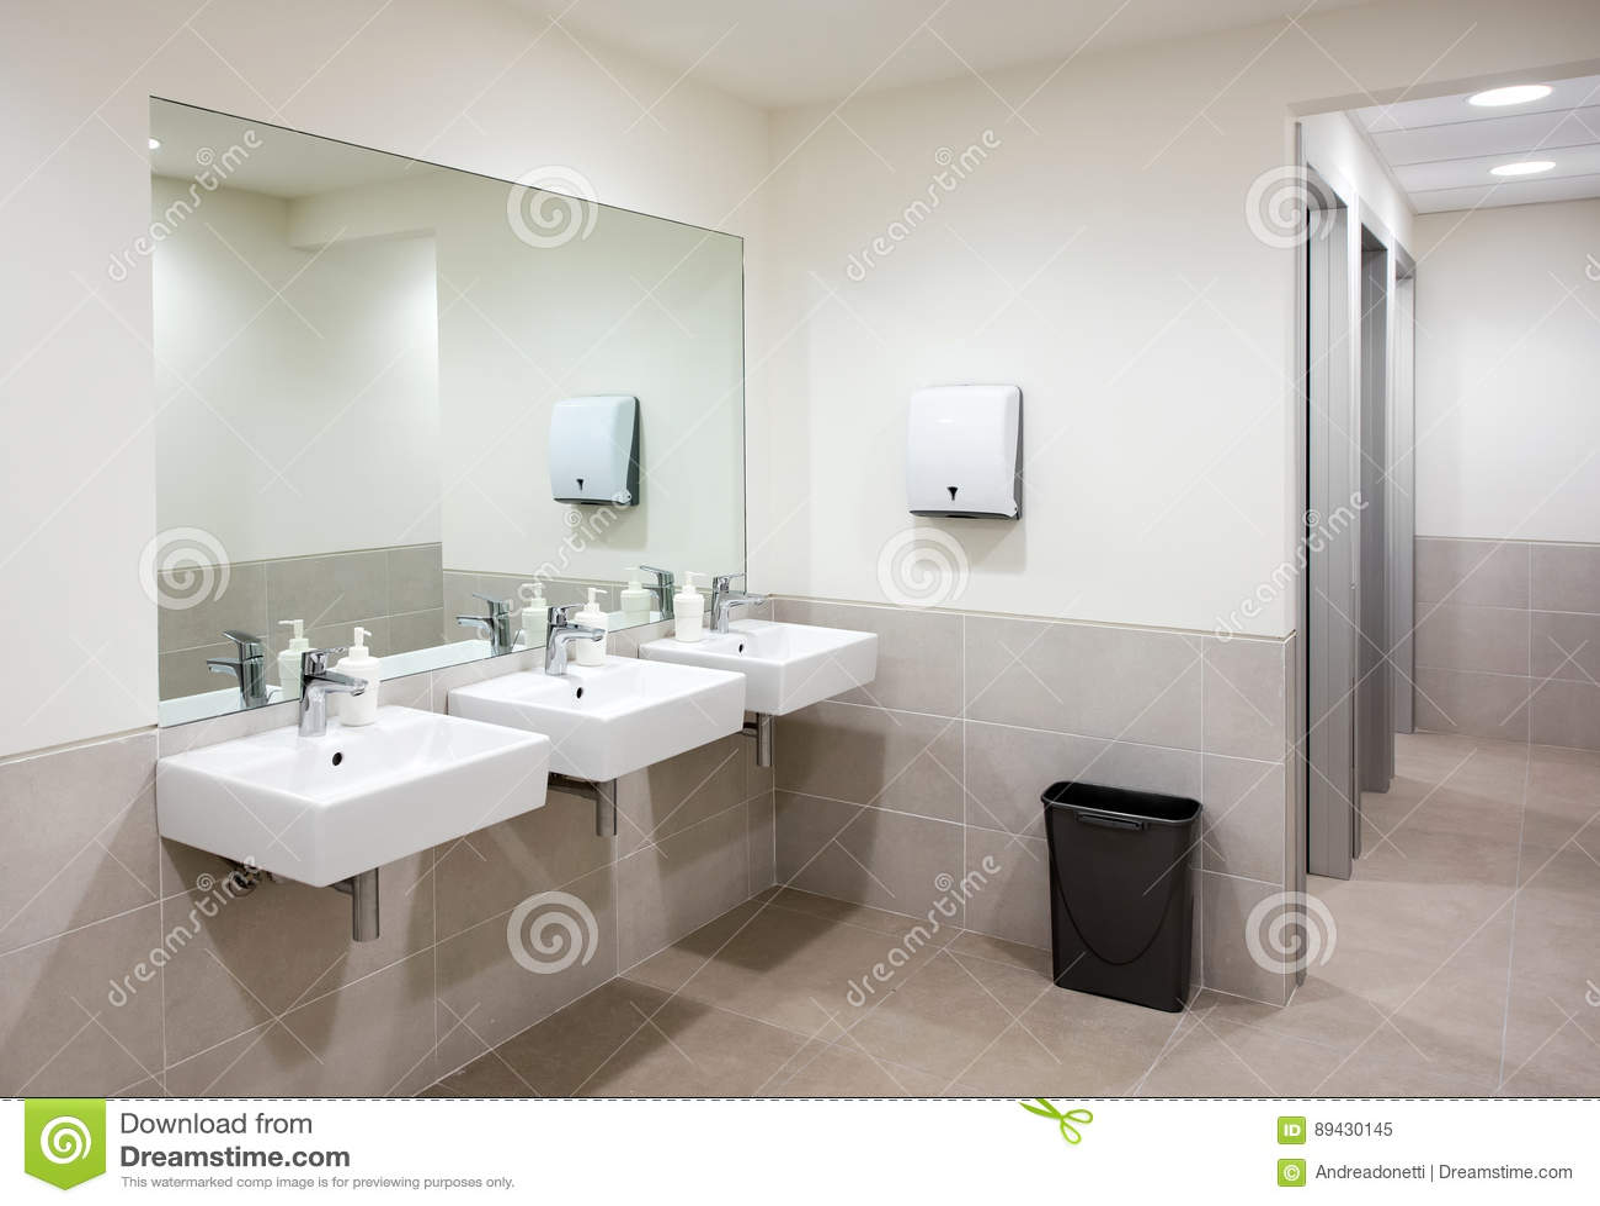 Public Bathroom Mirror public bathroom or restroom with hand basins stock photo - image